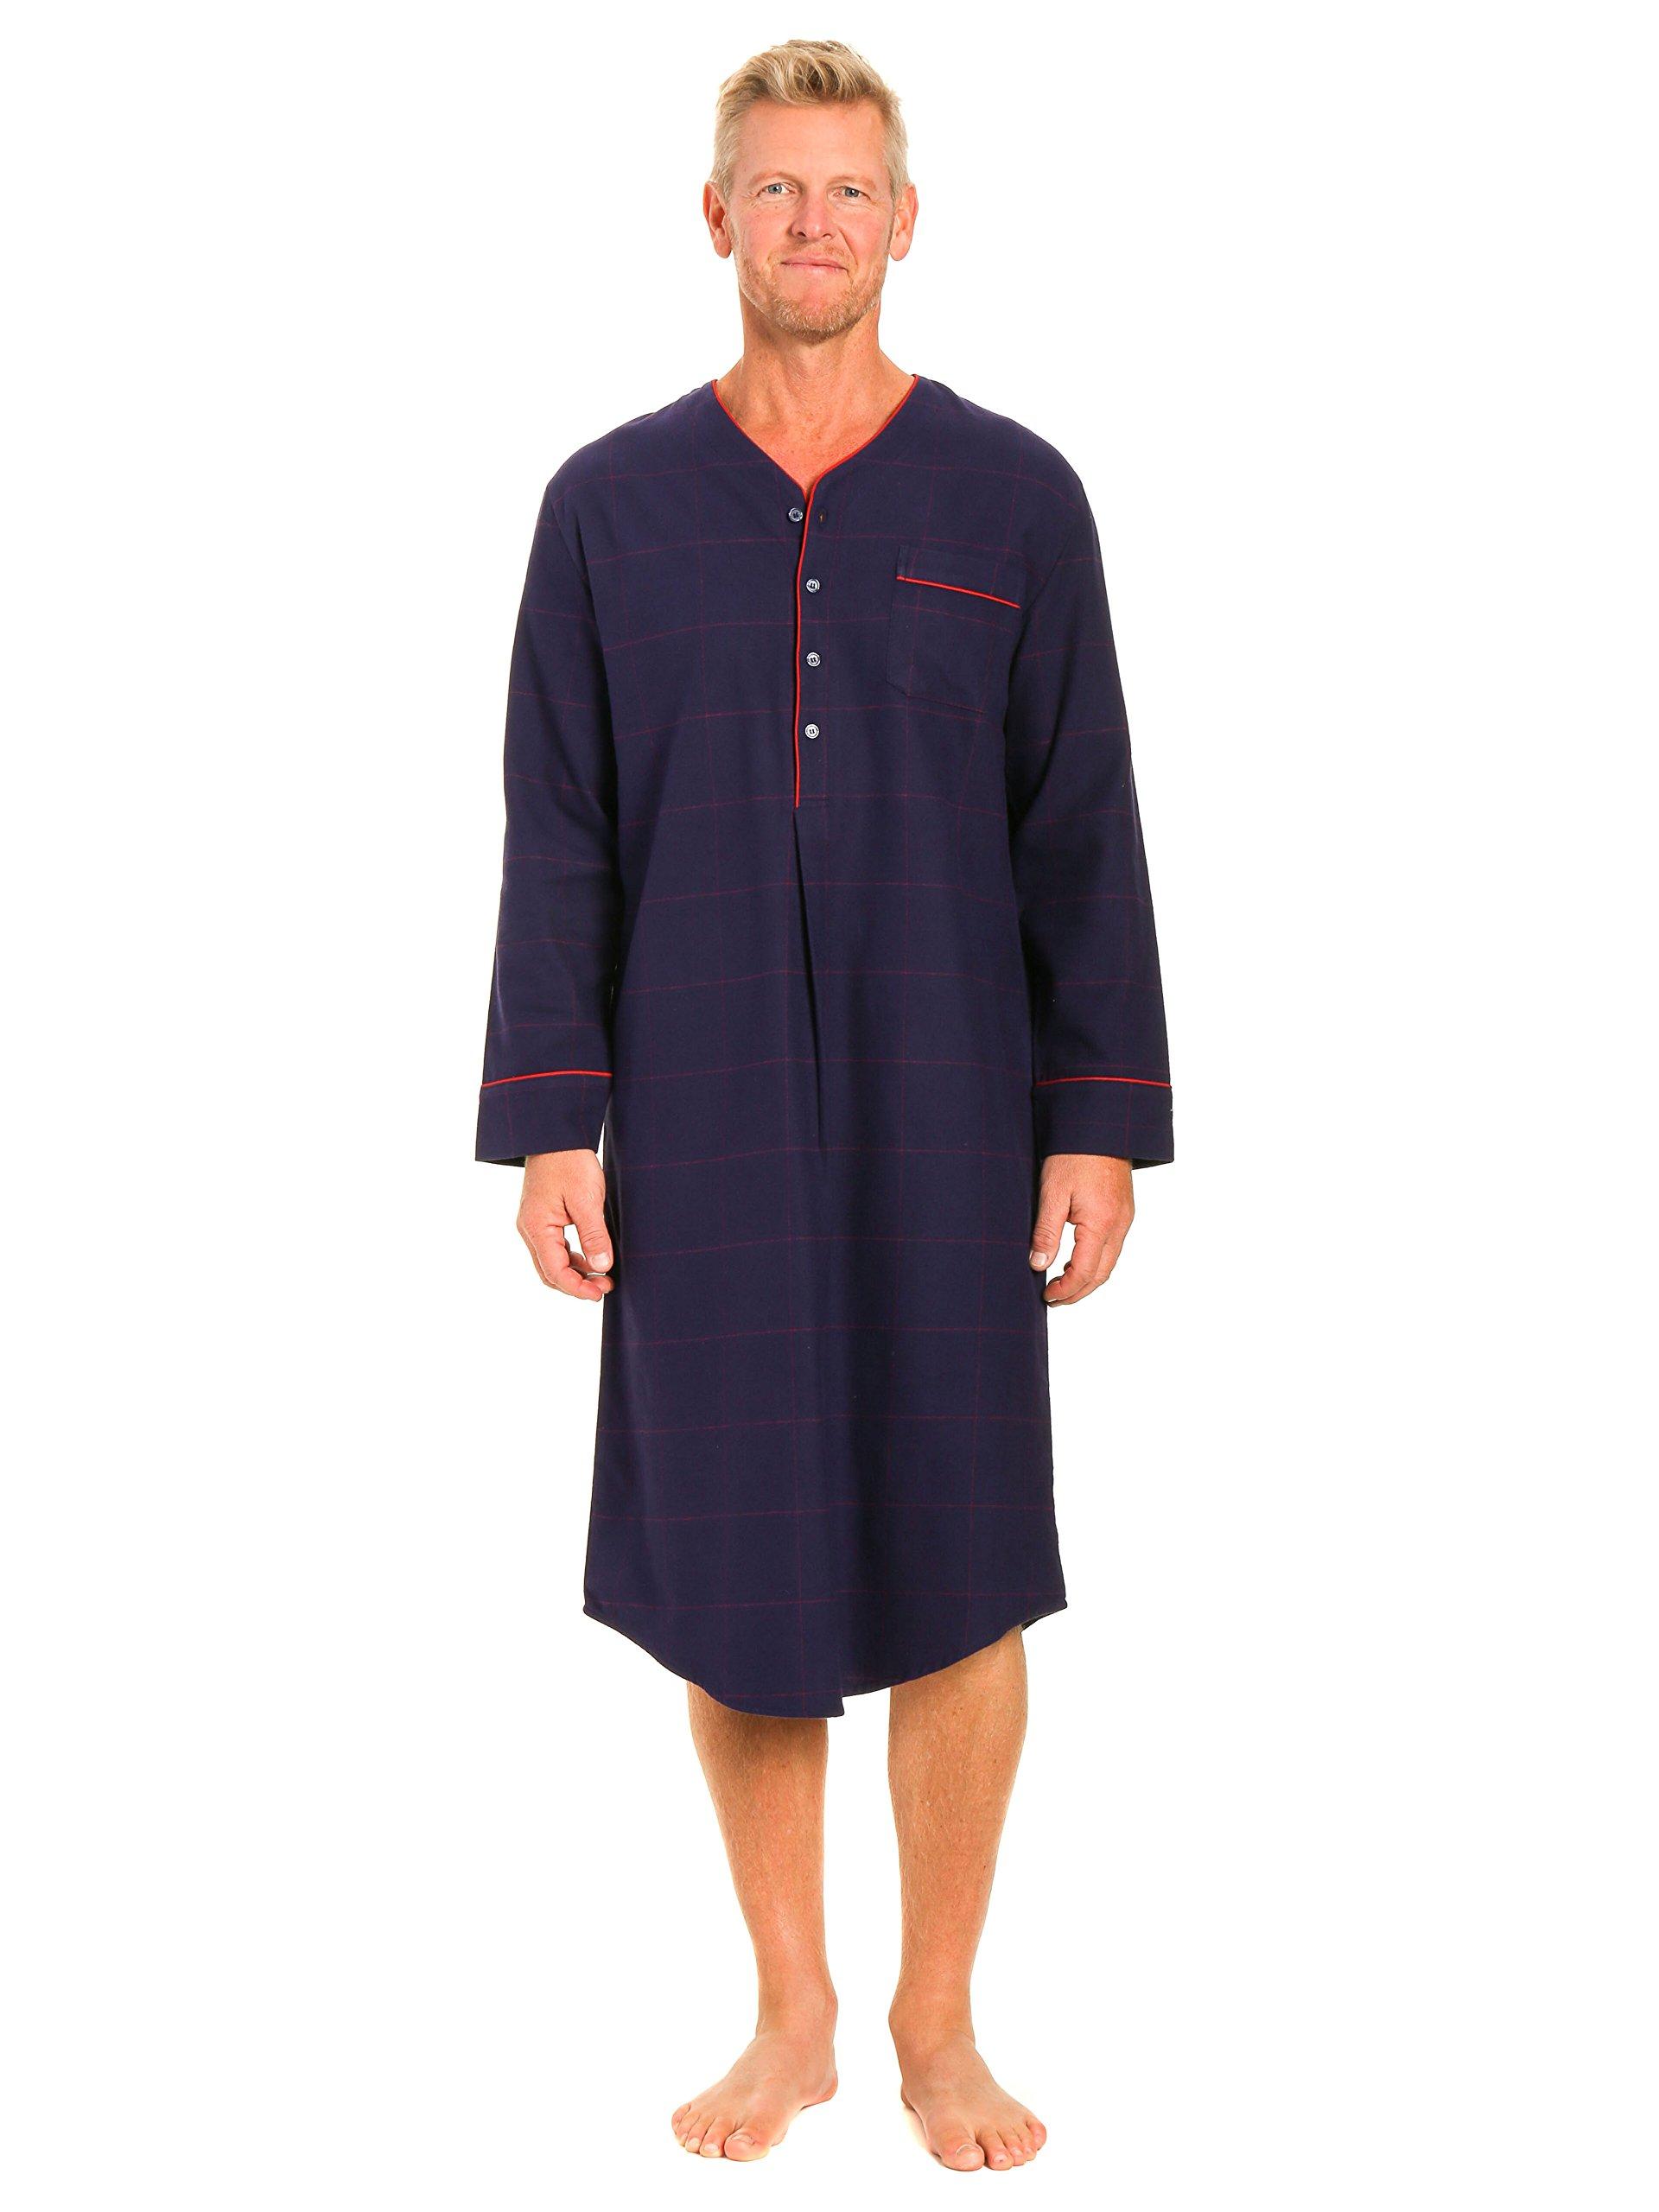 Noble Mount Men's Flannel Nightshirt - Windowpane Checks Blue/Red - Large